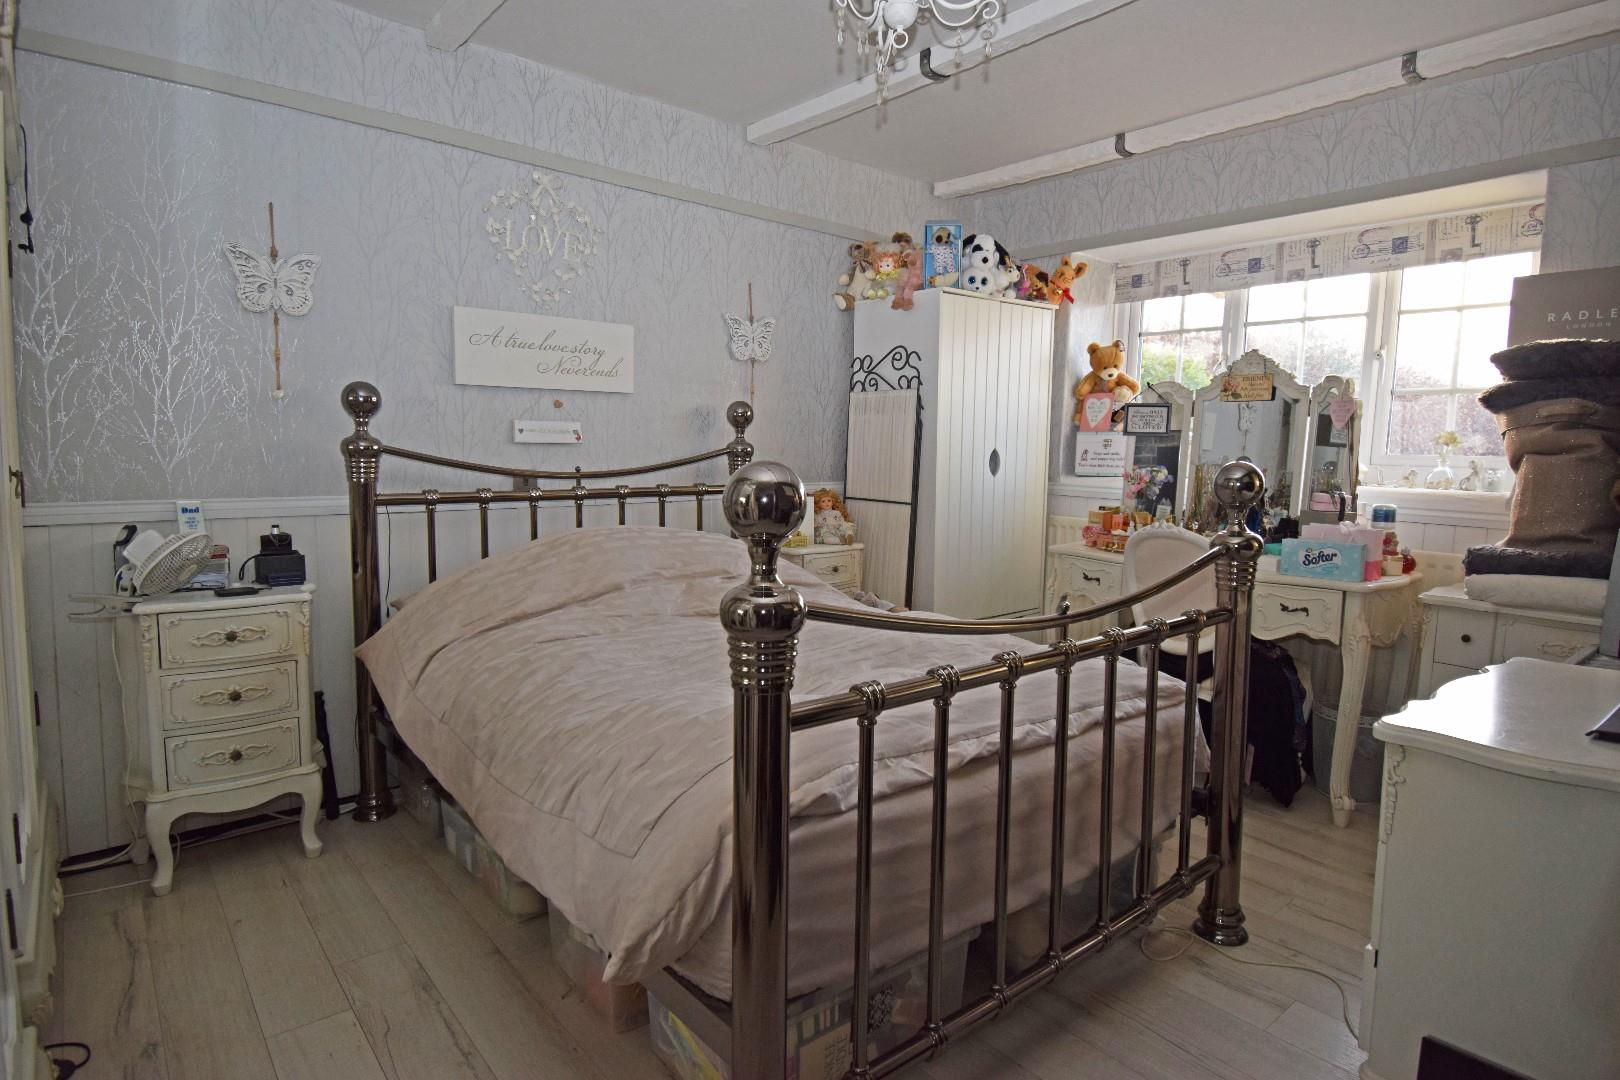 Woodend Cottage, 668 Birmingham Road, Lydiate Ash, Bromsgrove, B61 0QD